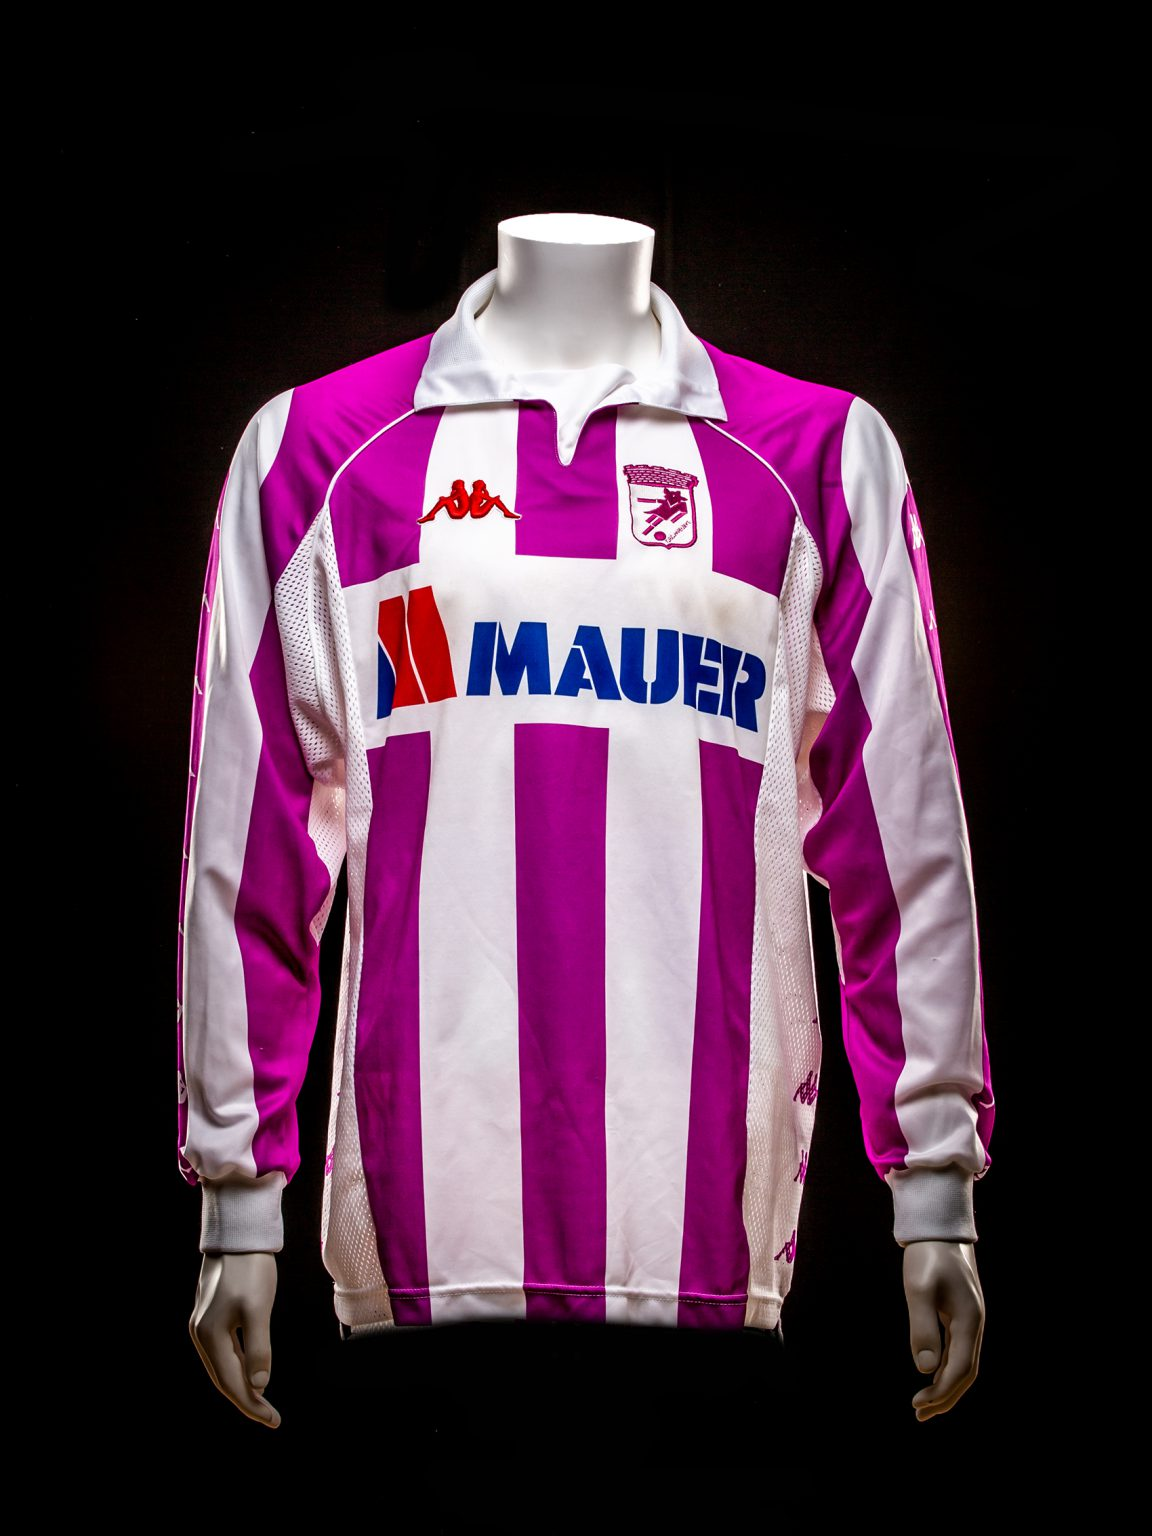 #8 Harelbeke Martin Laamers